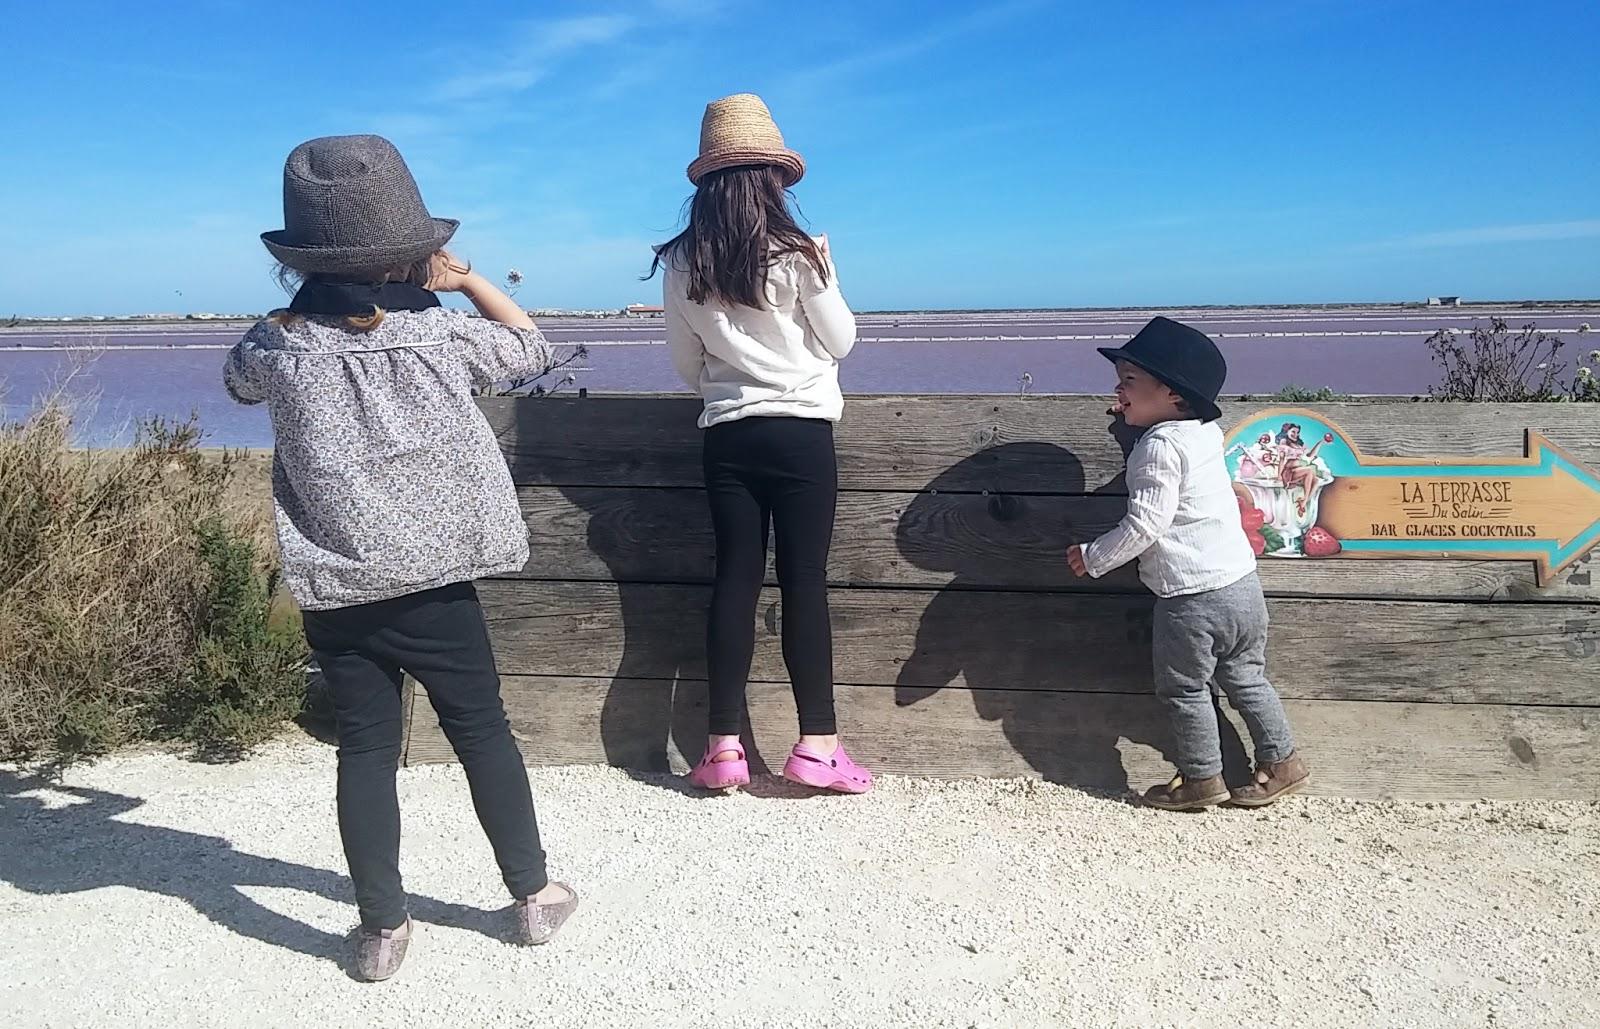 Sortie en famille les salins de gruissan for Sortie en famille dans les yvelines